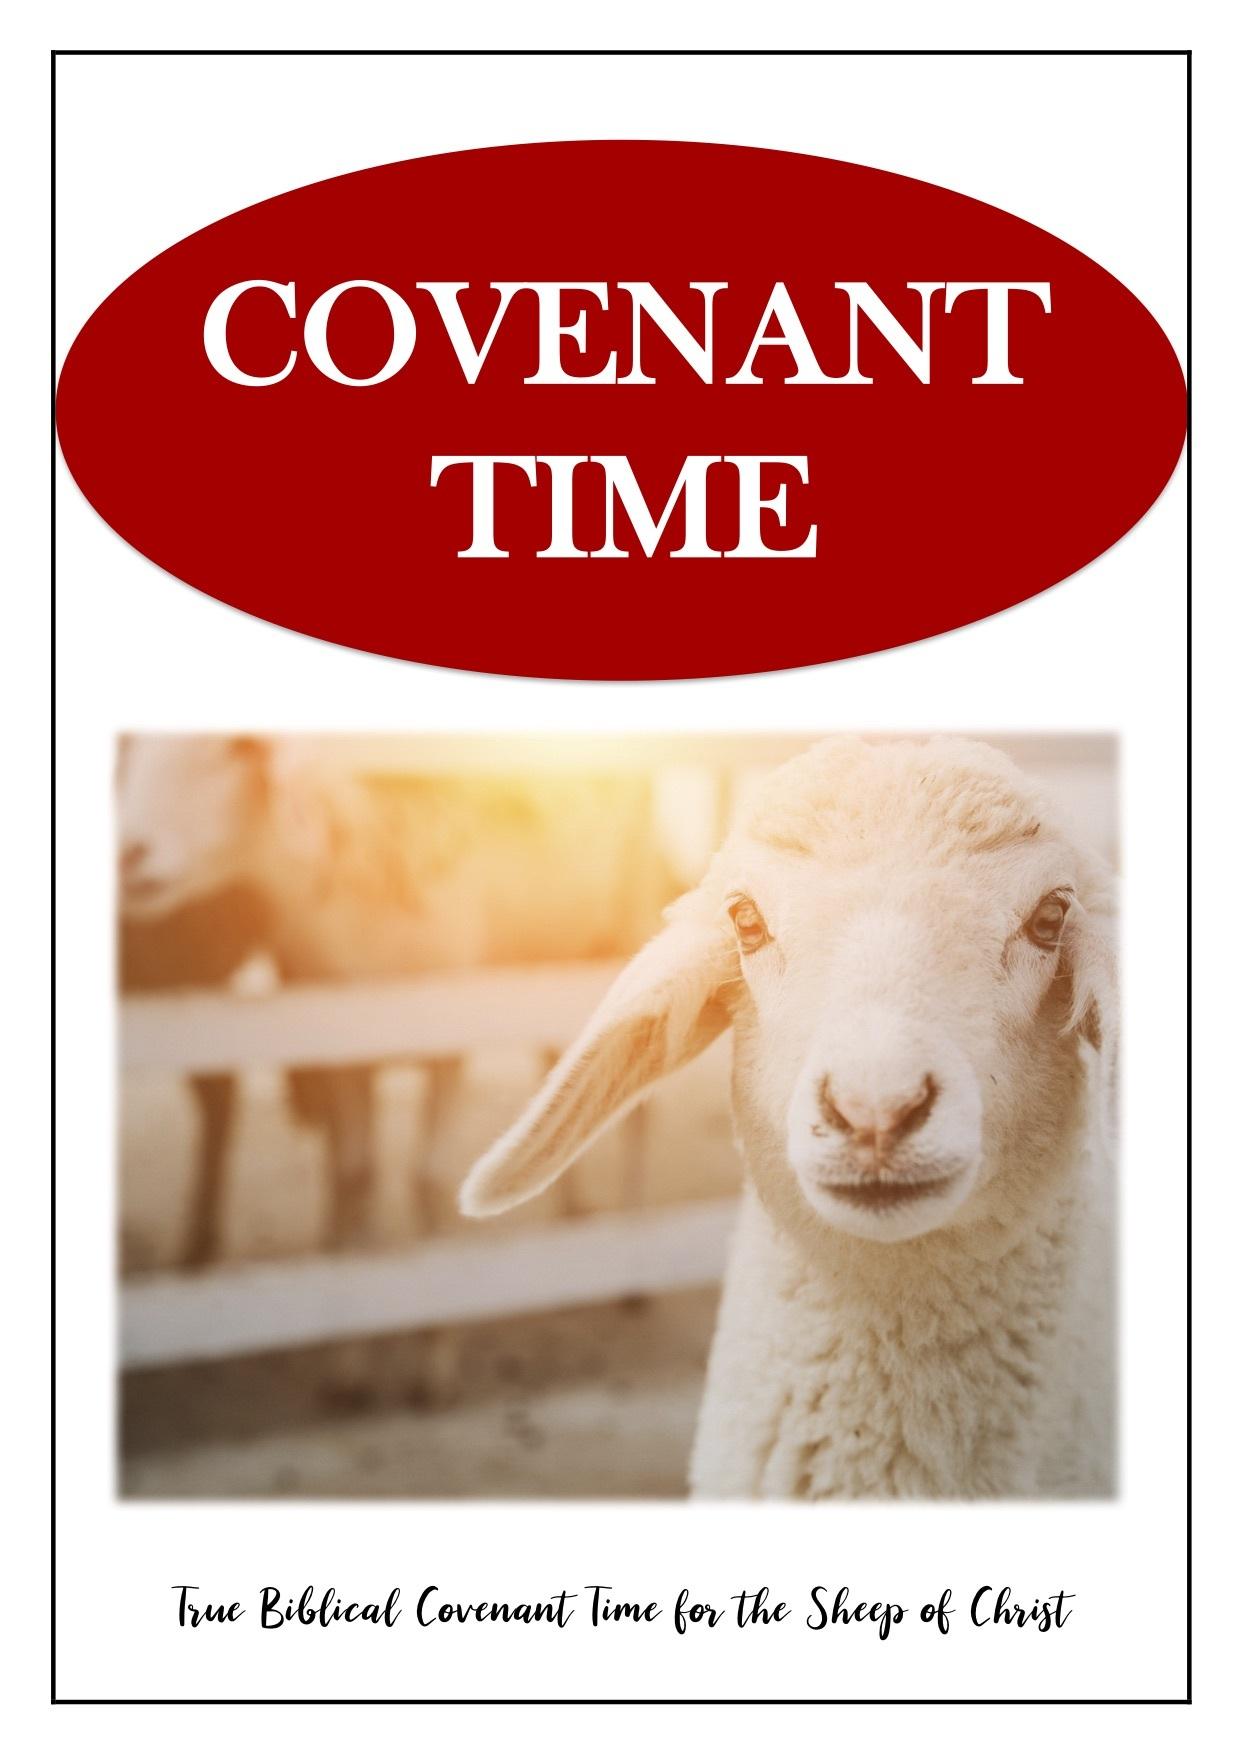 Revised - Covenant Time Booklet 2019 SKU EBCTB